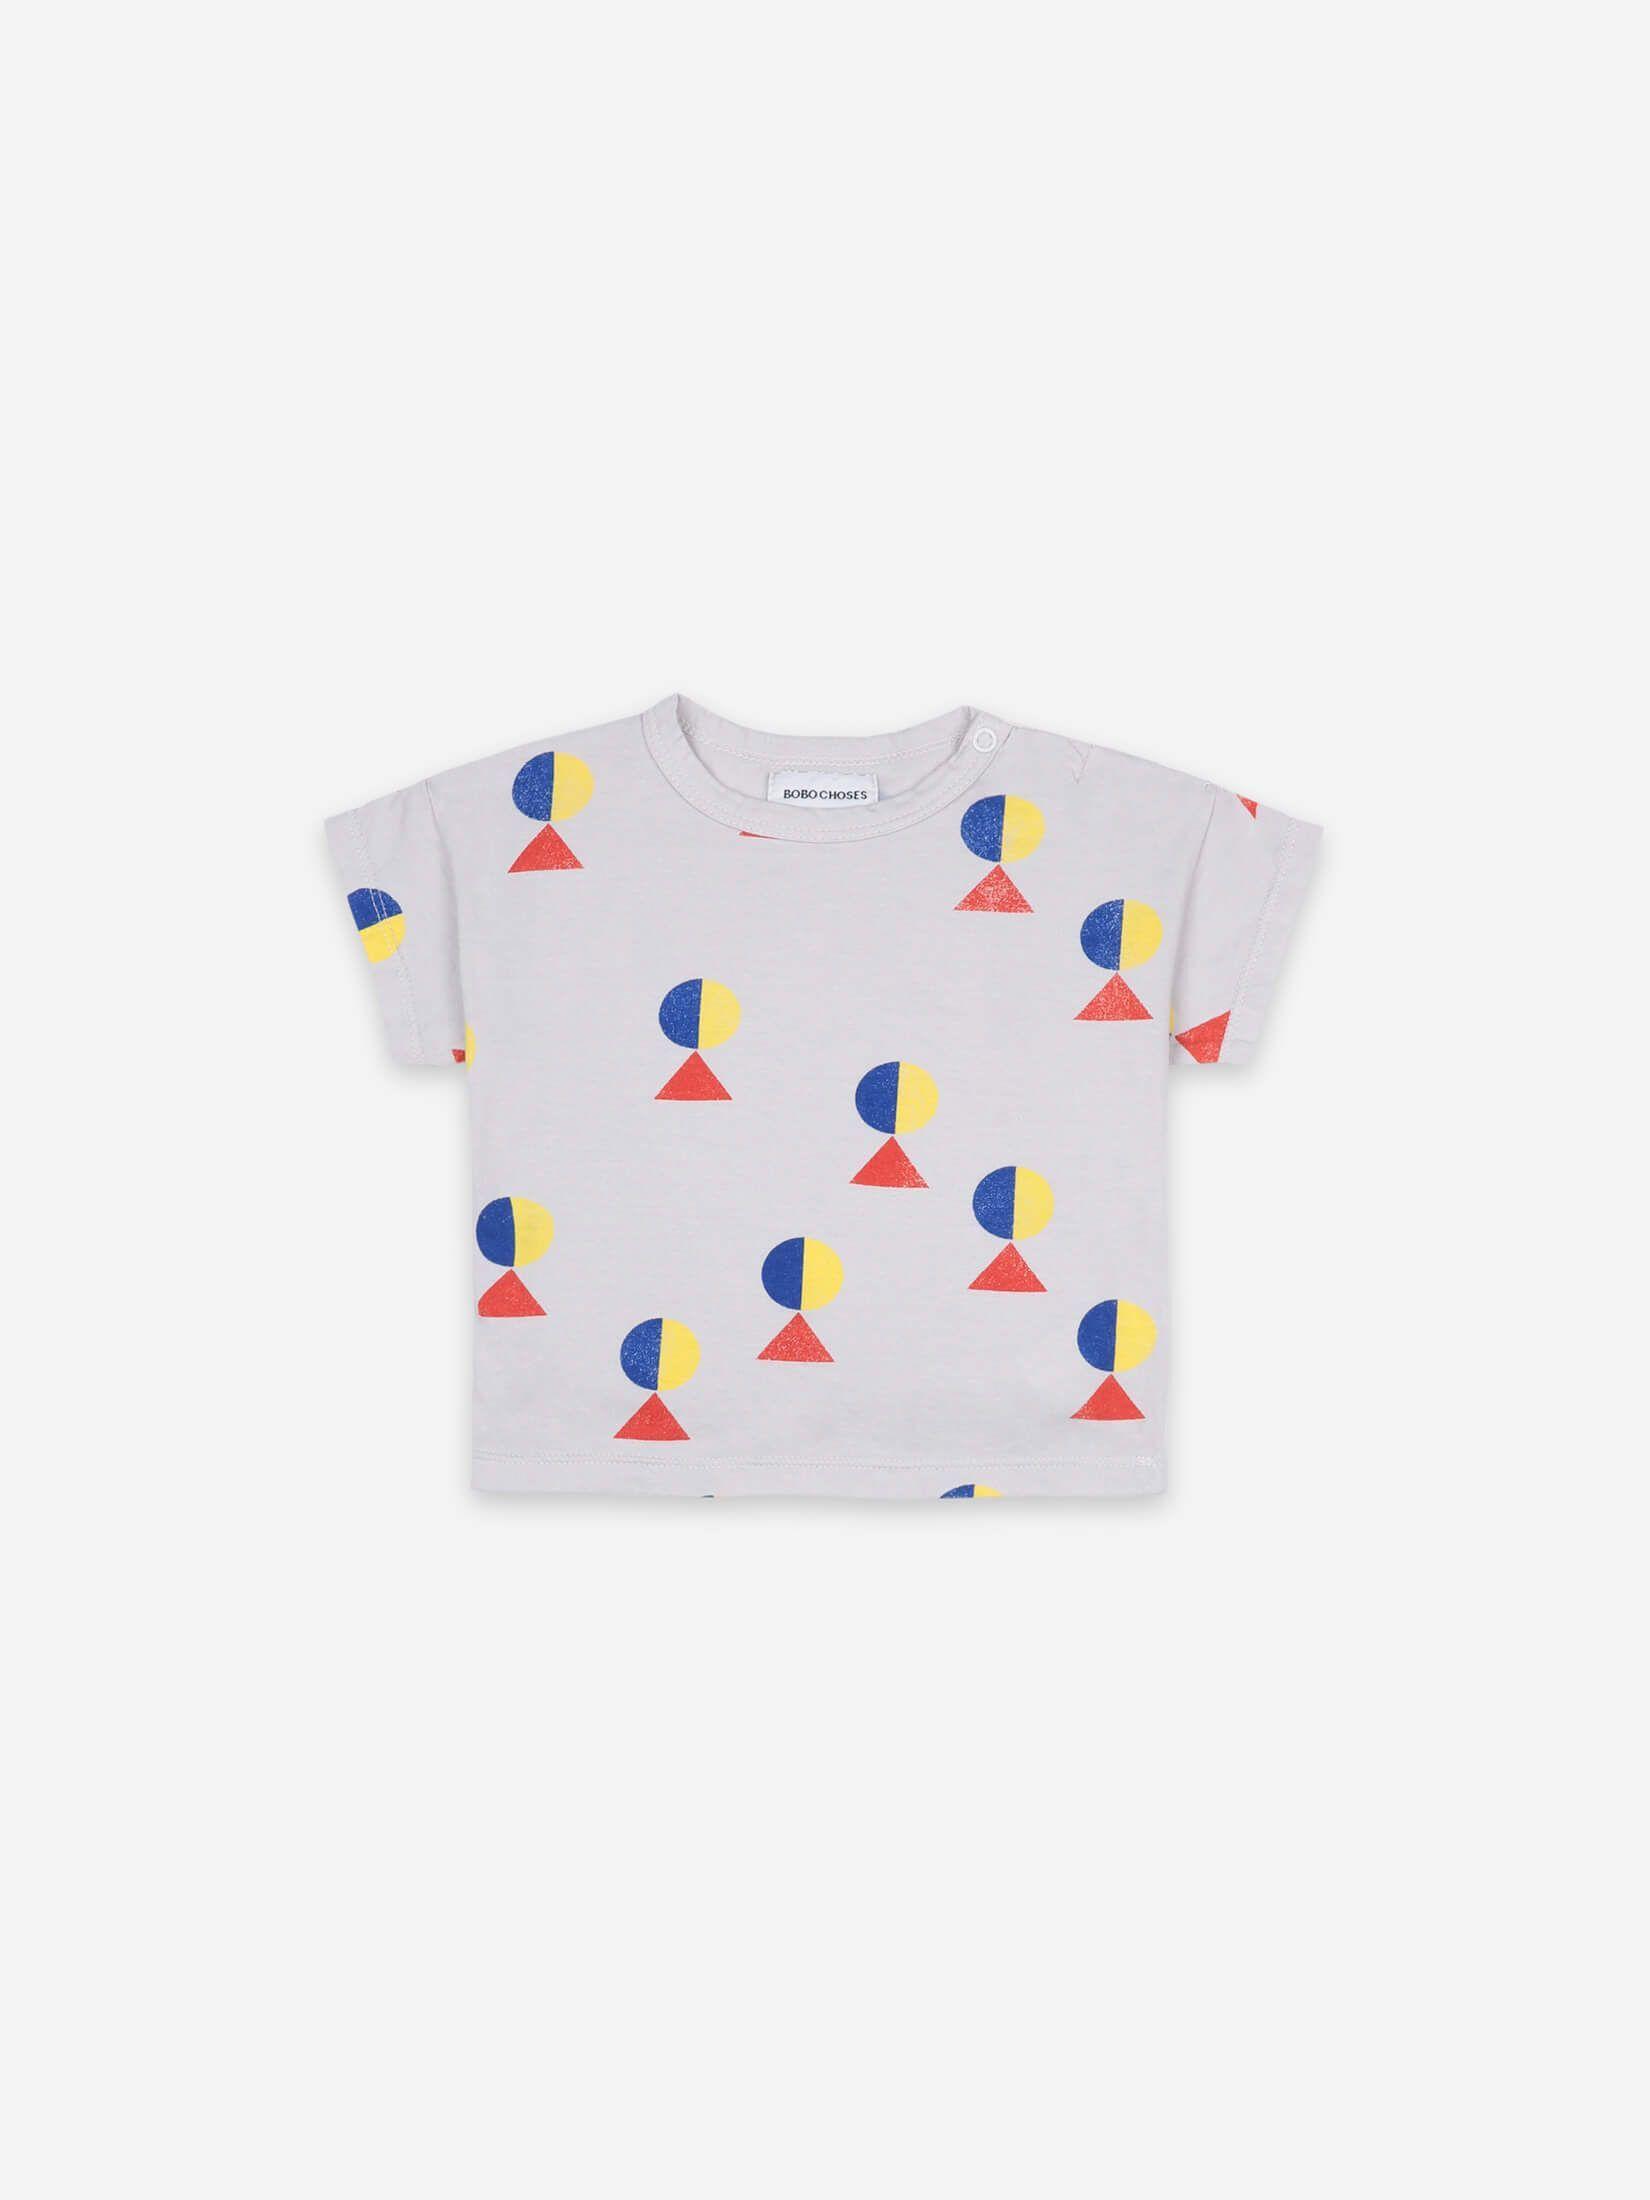 BOBO CHOSES ボボショセス Geometric All Over Short Sleeve T-shirt(左肩スナップ付) size:12-18M(80-90)~24-36M(90-100)